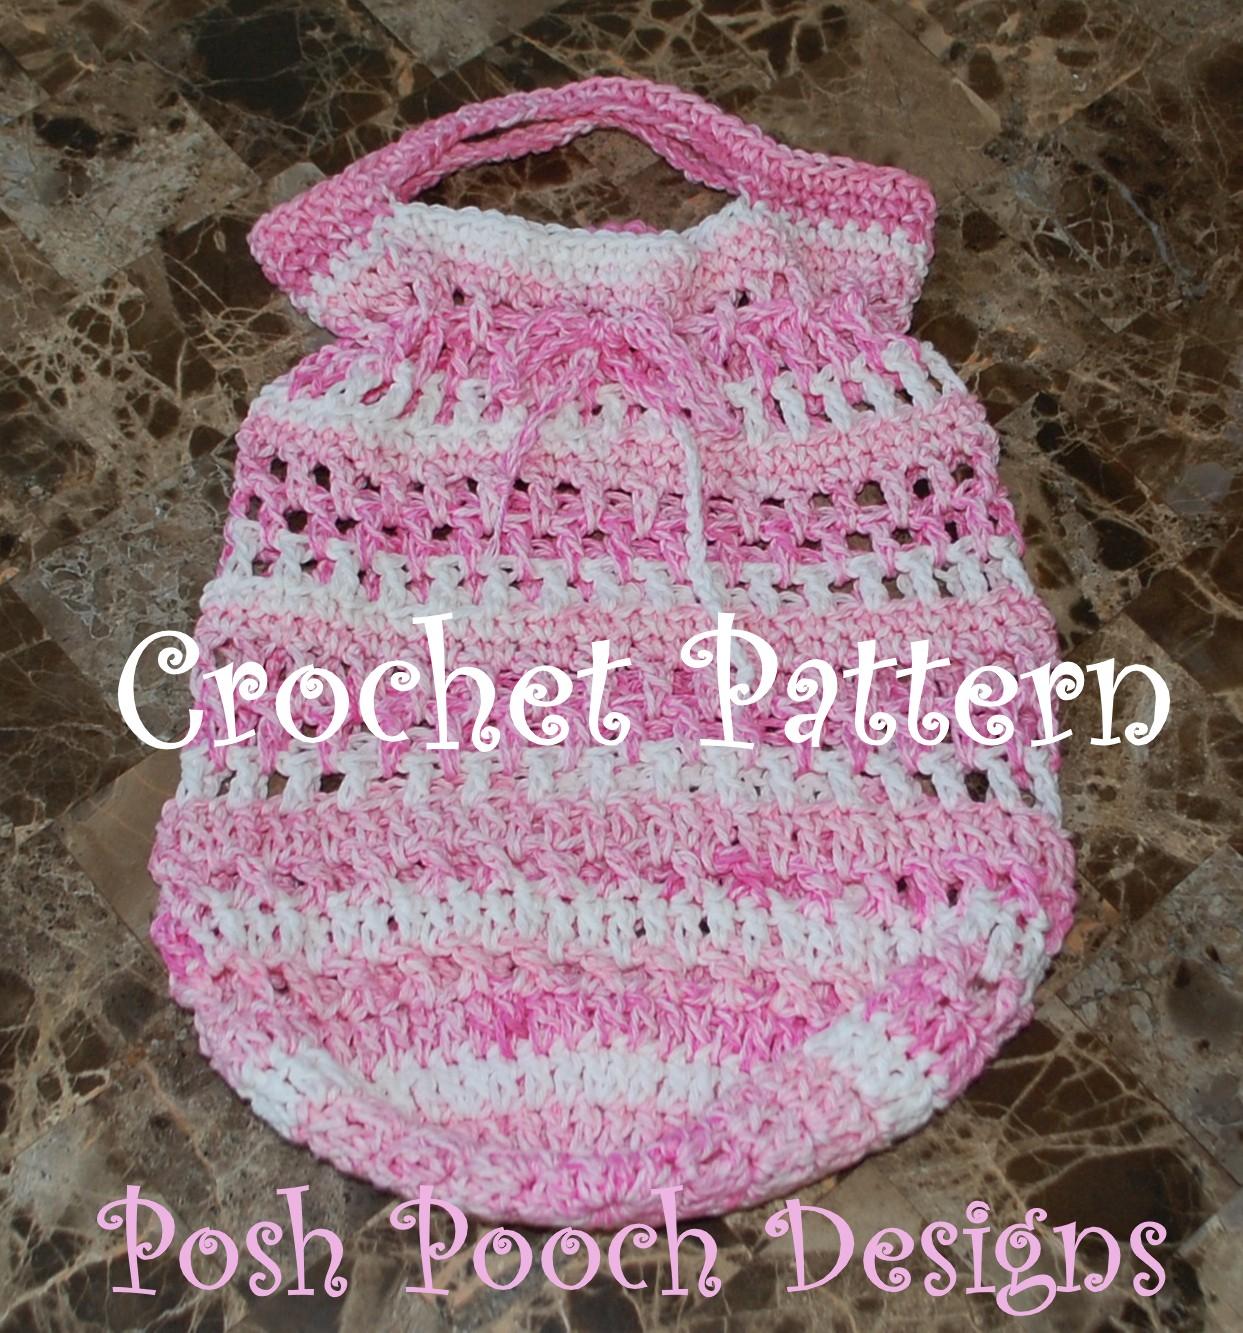 Crochet Cotton Bag : ... Designs Dog Clothes: Round Bottom Cotton Shopping Bag Crochet Pattern